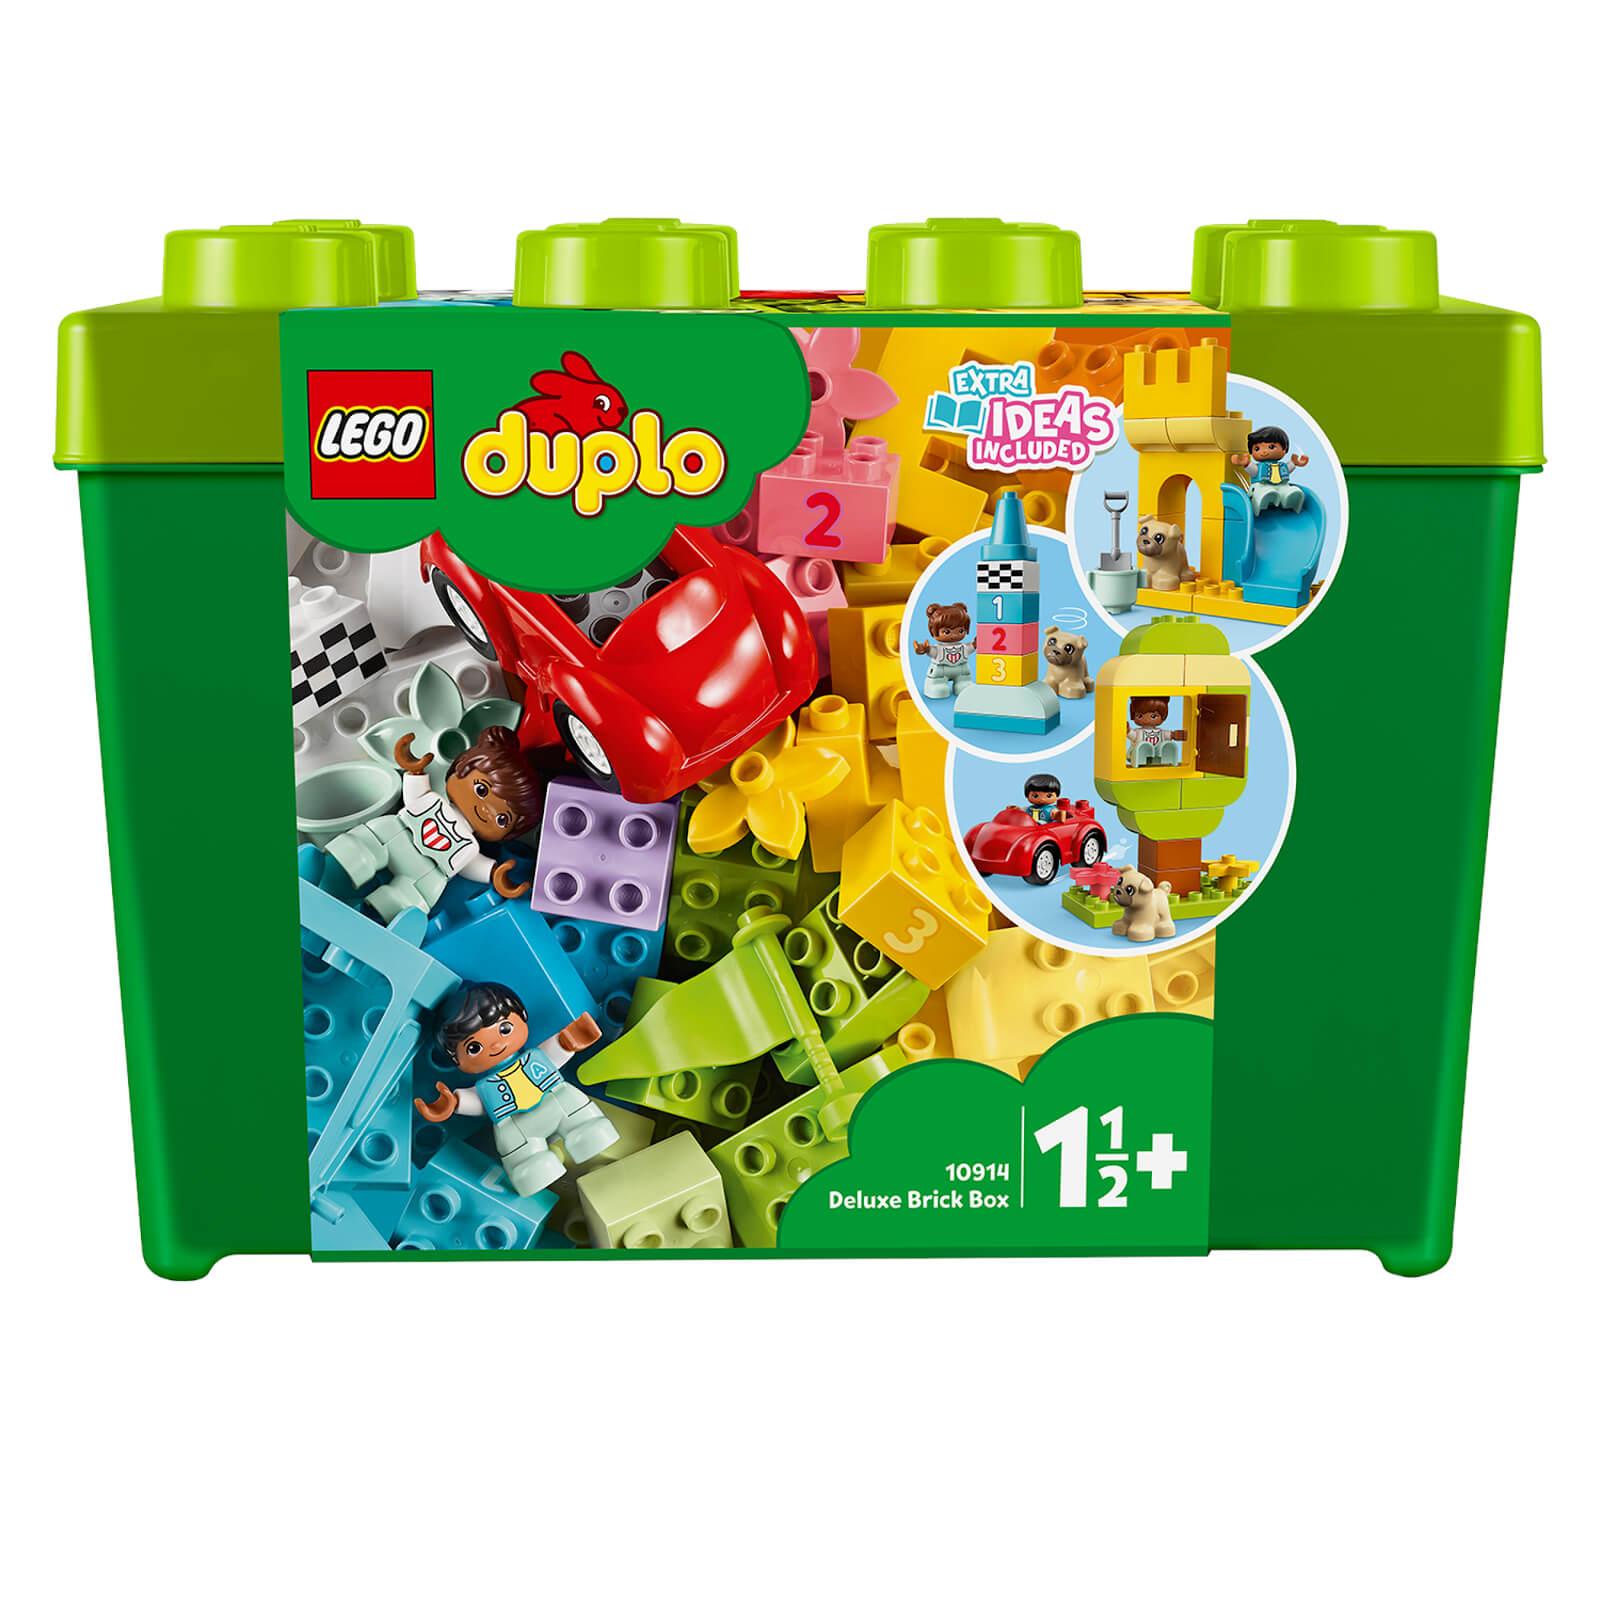 Image of 10914 LEGO® DUPLO® LEGO® DUPLO® Deluxe Brick Box